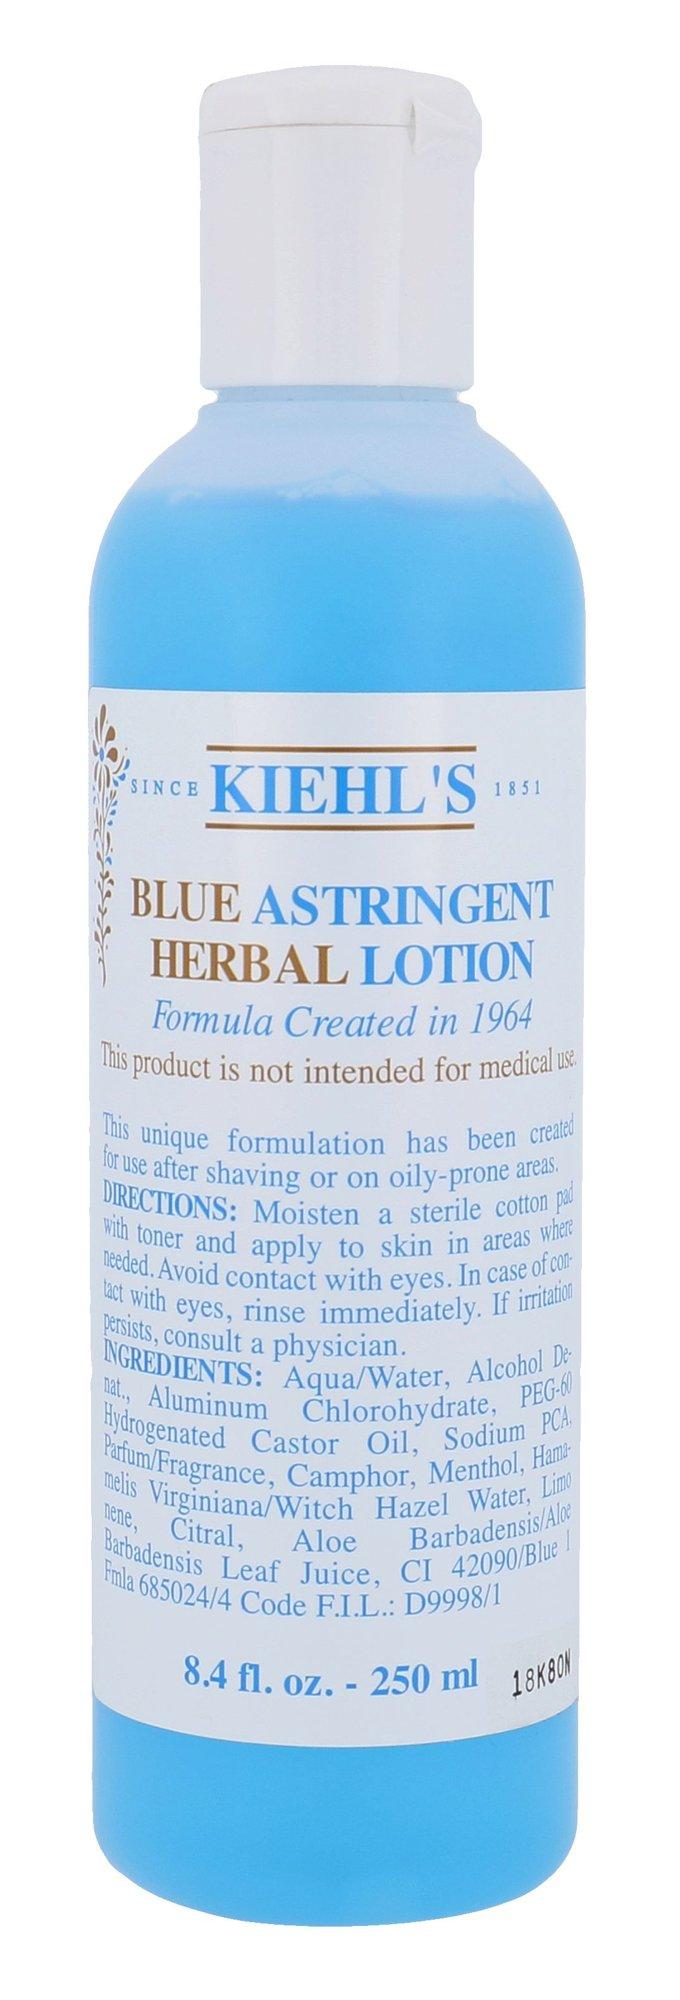 Kiehl´s Blue Astringent Herbal Lotion Cosmetic 250ml